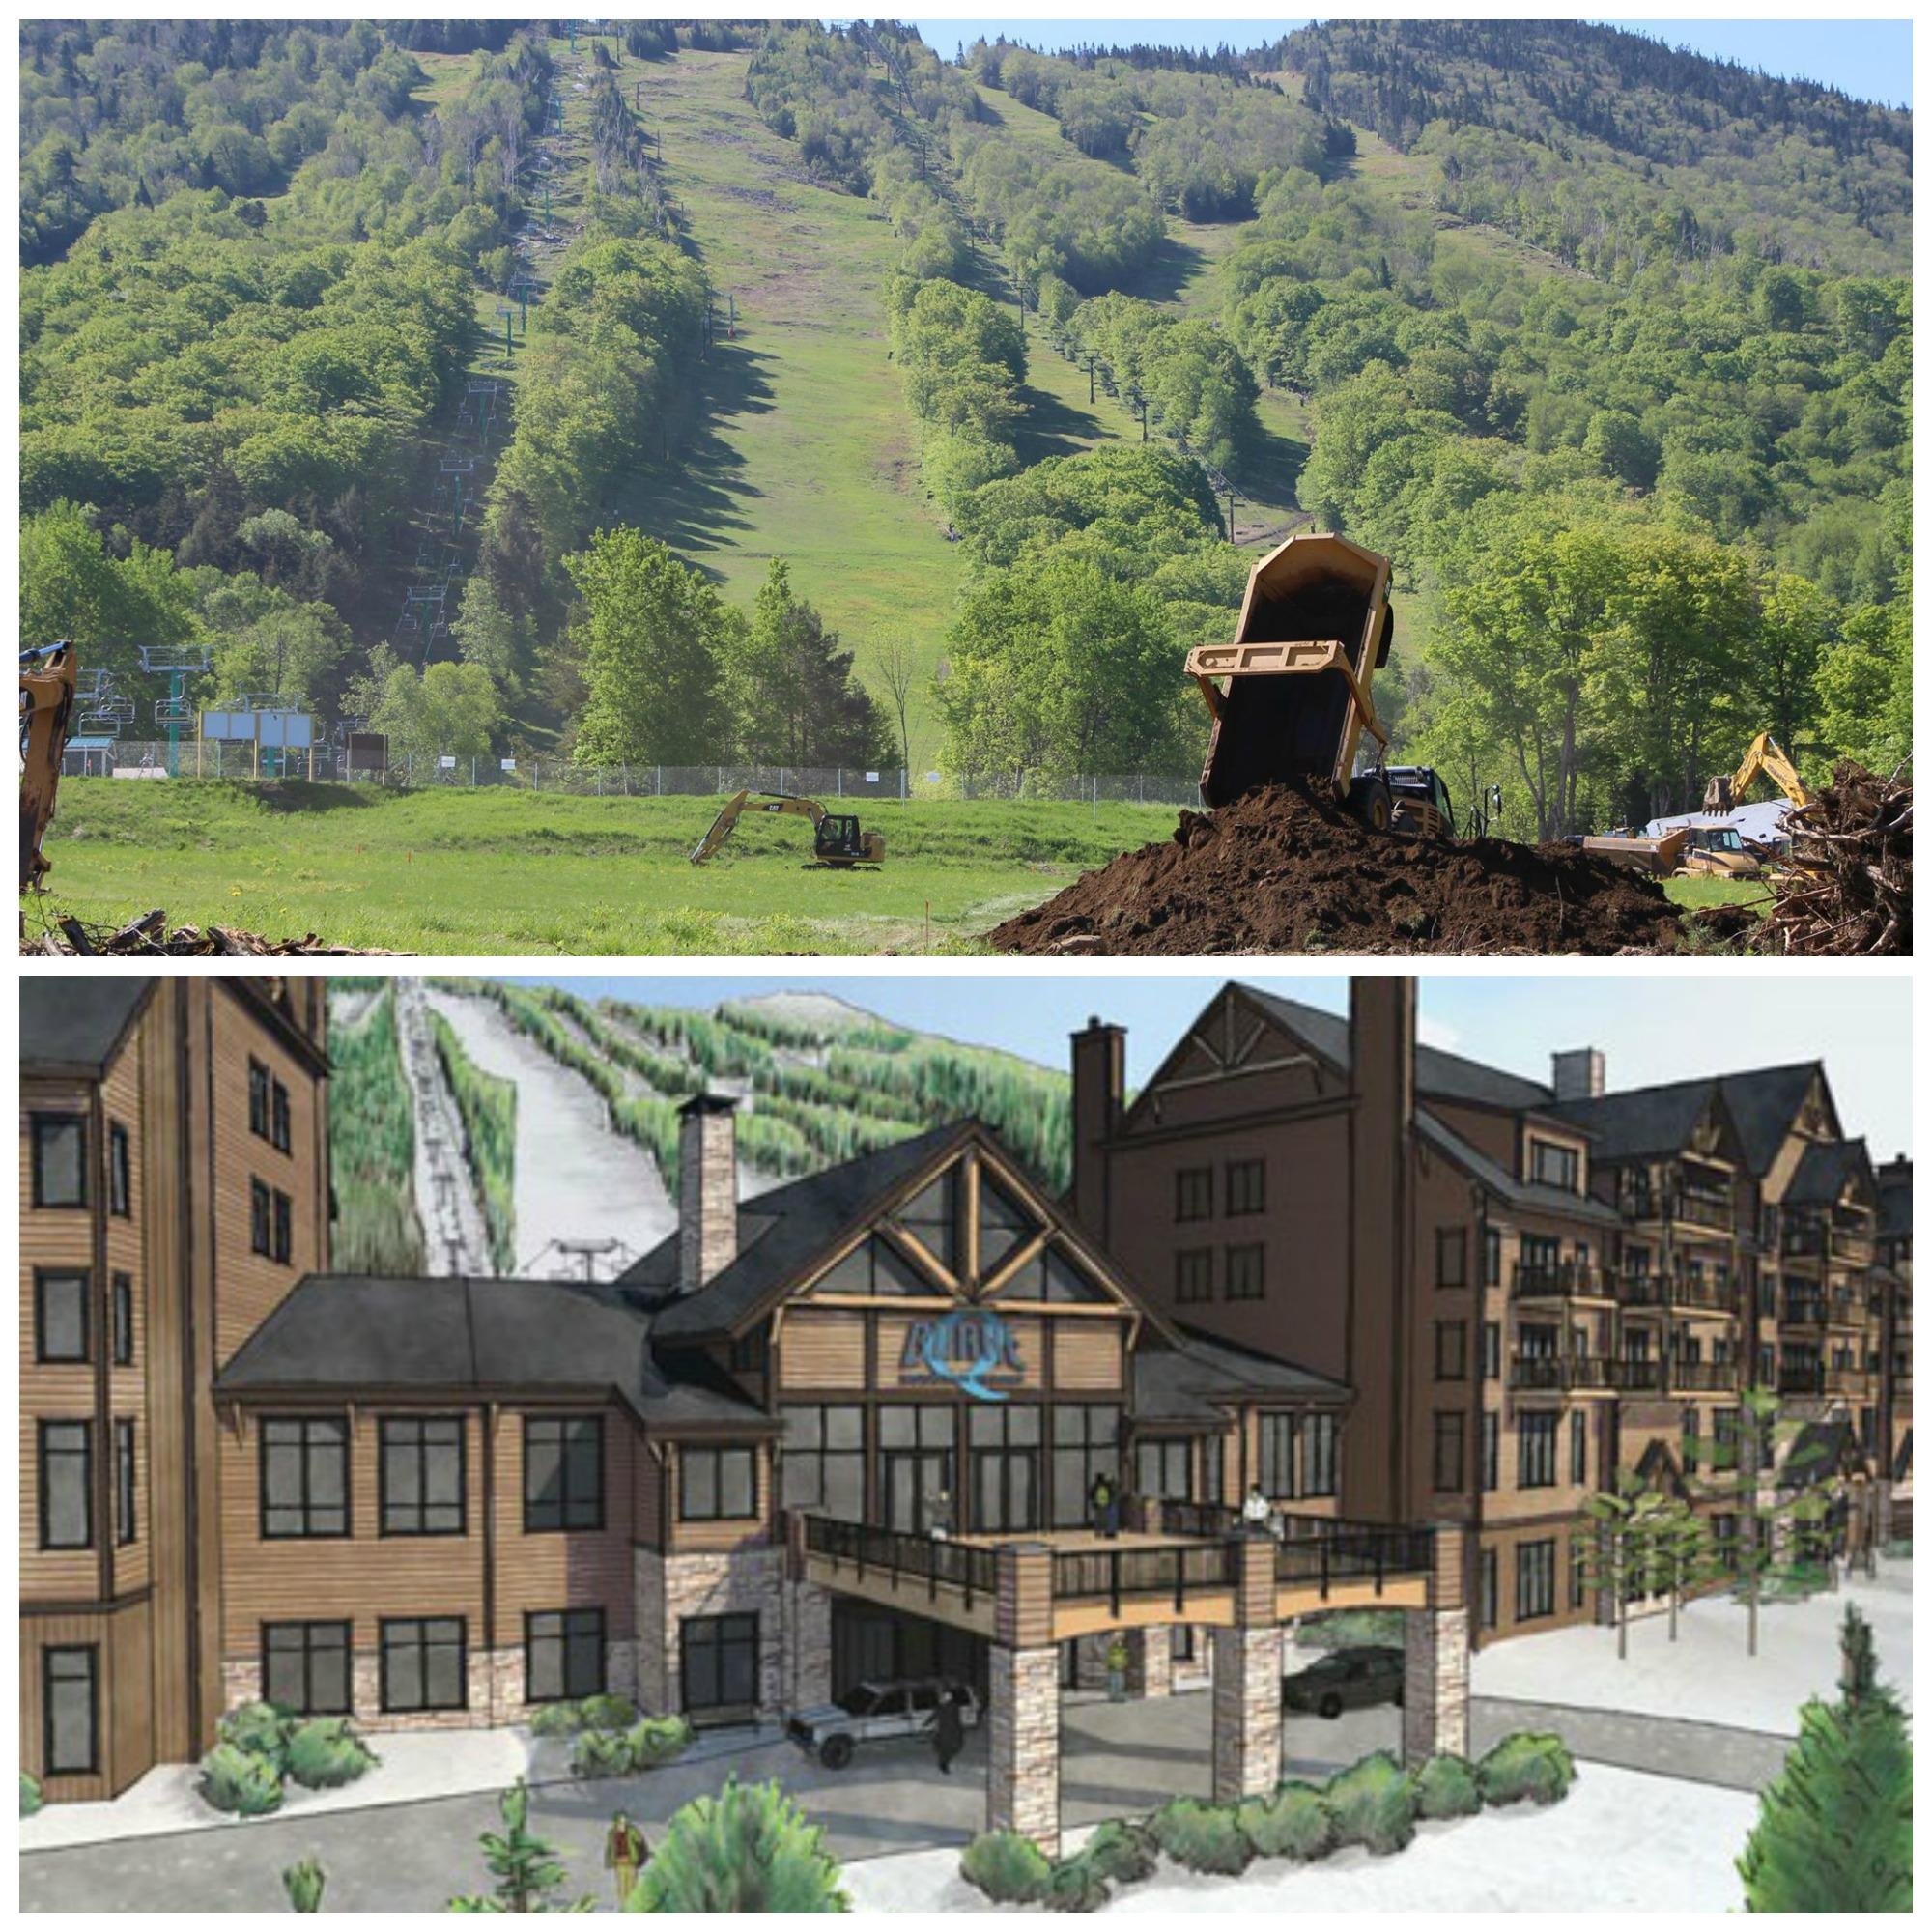 a sneak peek at q burke mountain resort hotel - newport dispatch